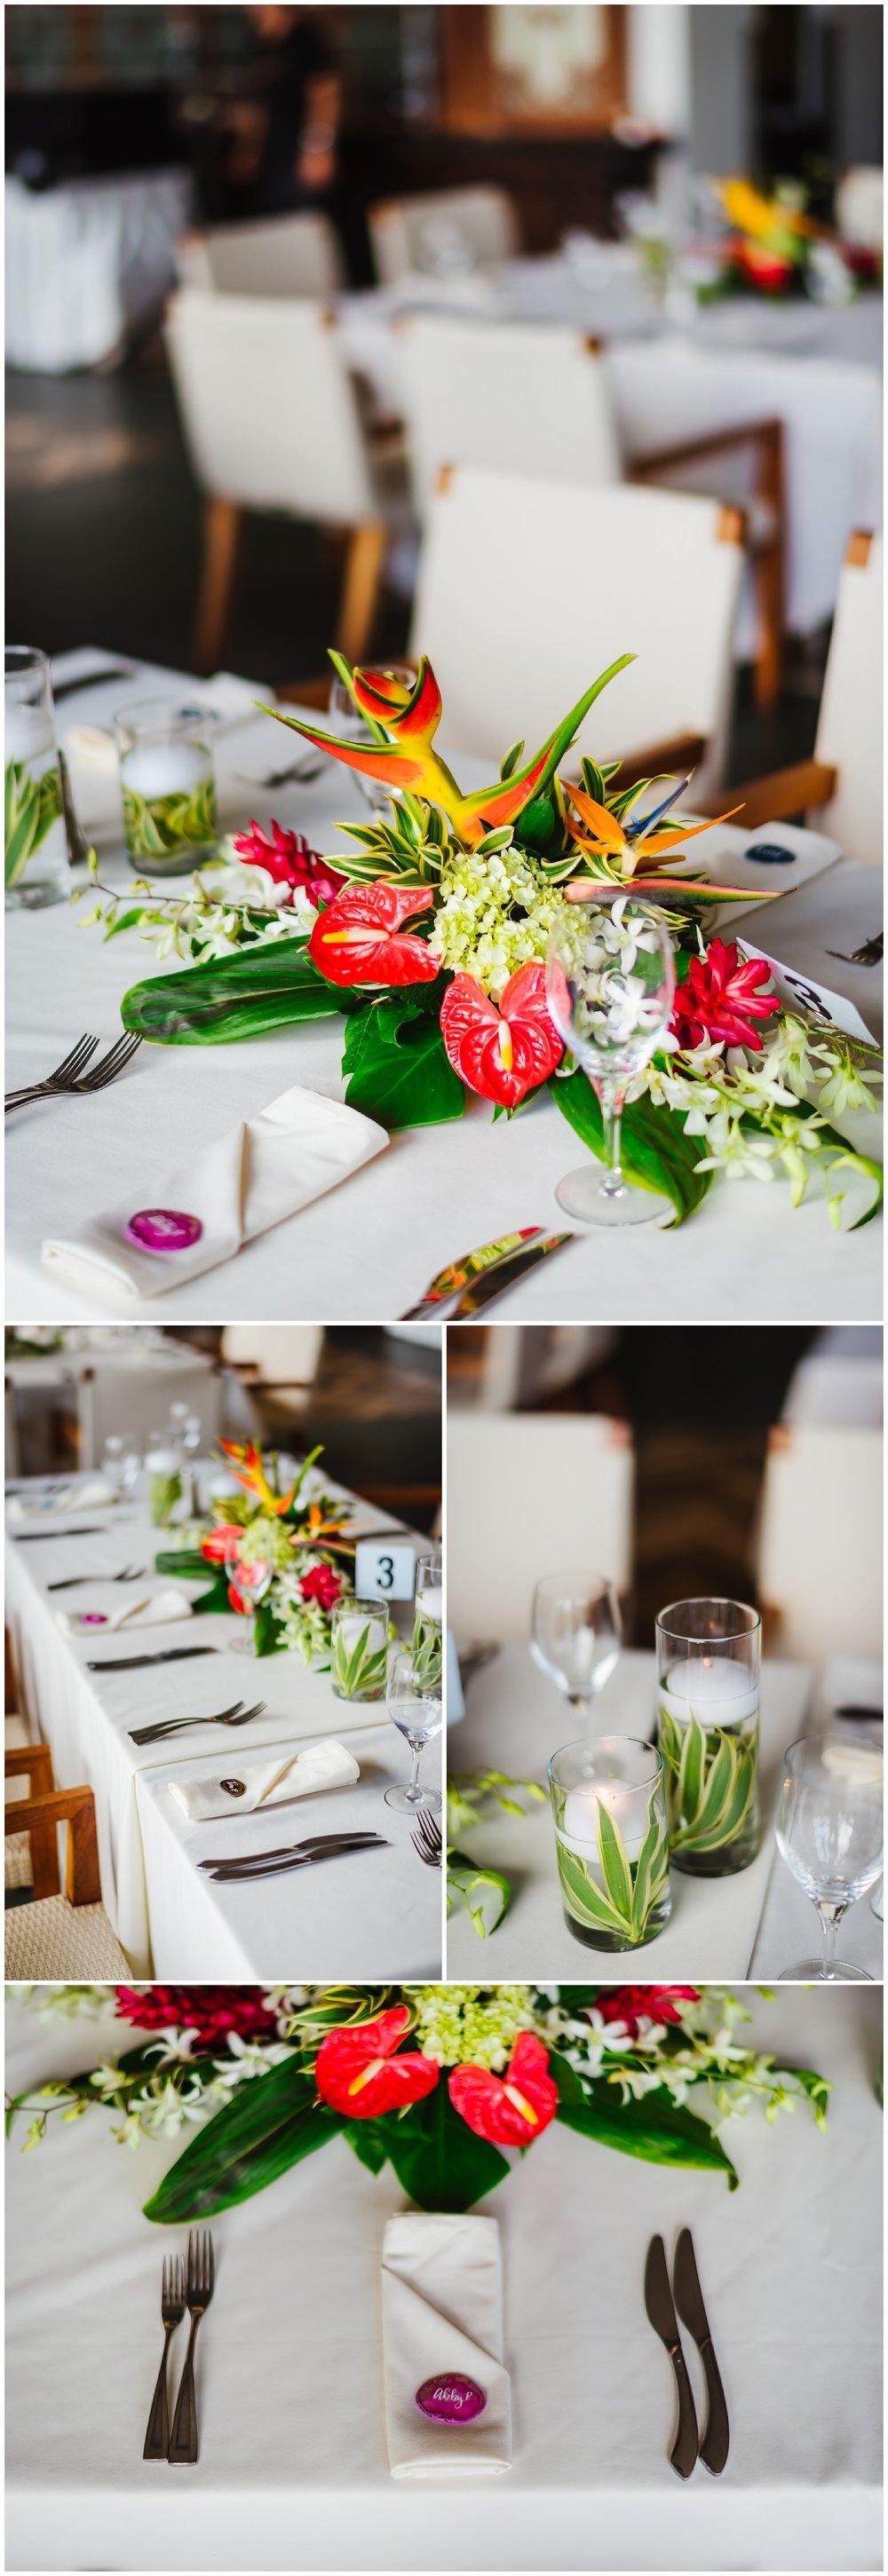 destination-wedding-hawaii-kauai-grand-hyatt-resort-napali-coast-sail_0085.jpg